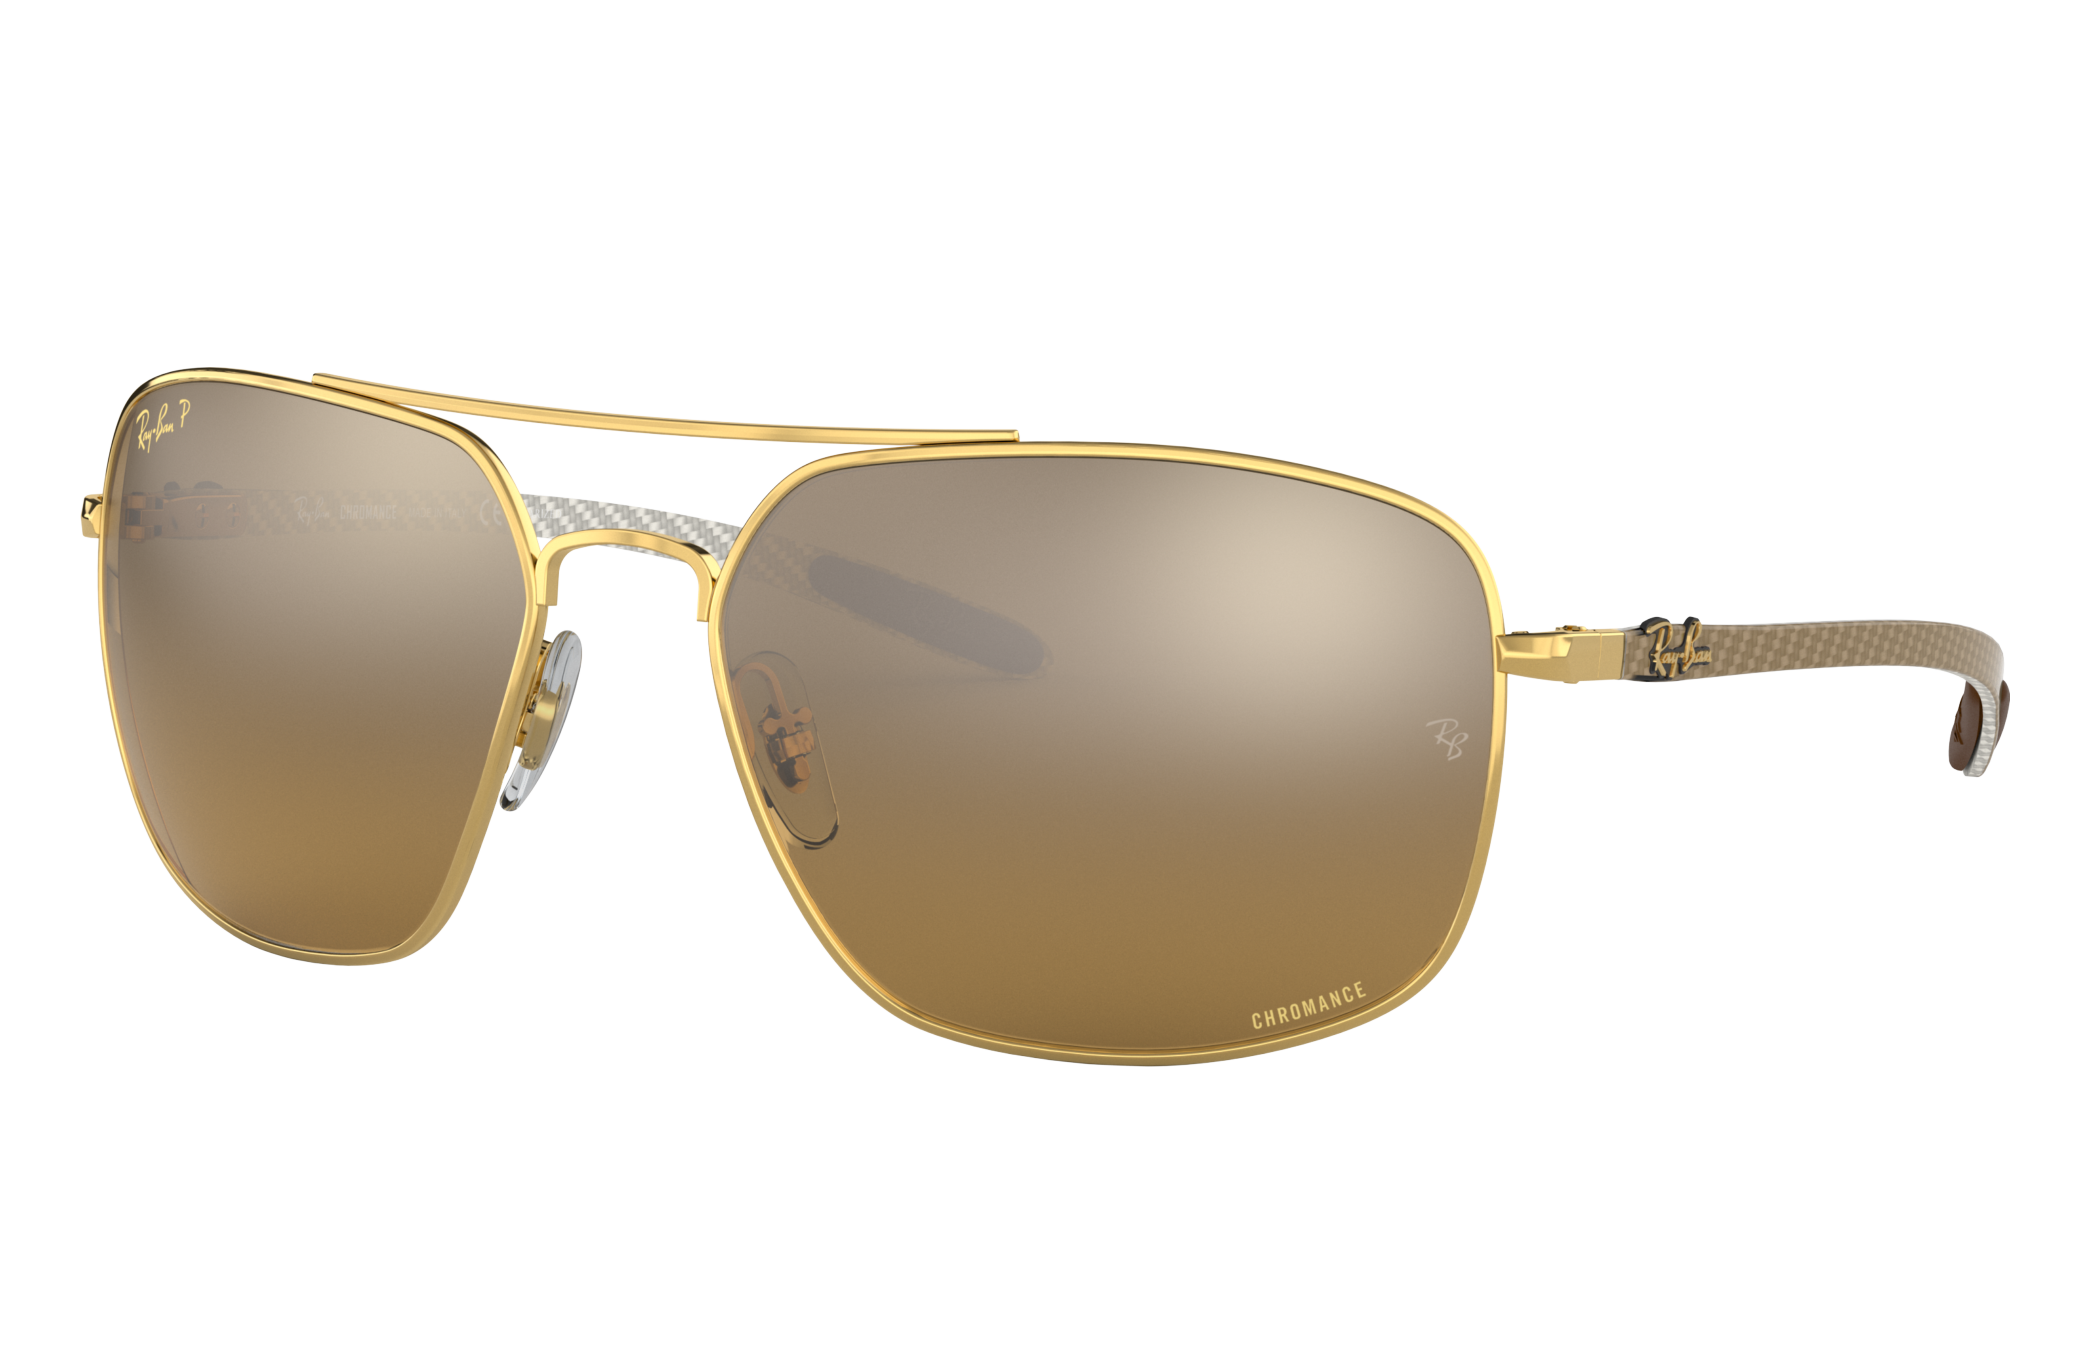 Ray-Ban Rb8322 Chromance Gold, Polarized Brown Lenses - RB8322CH